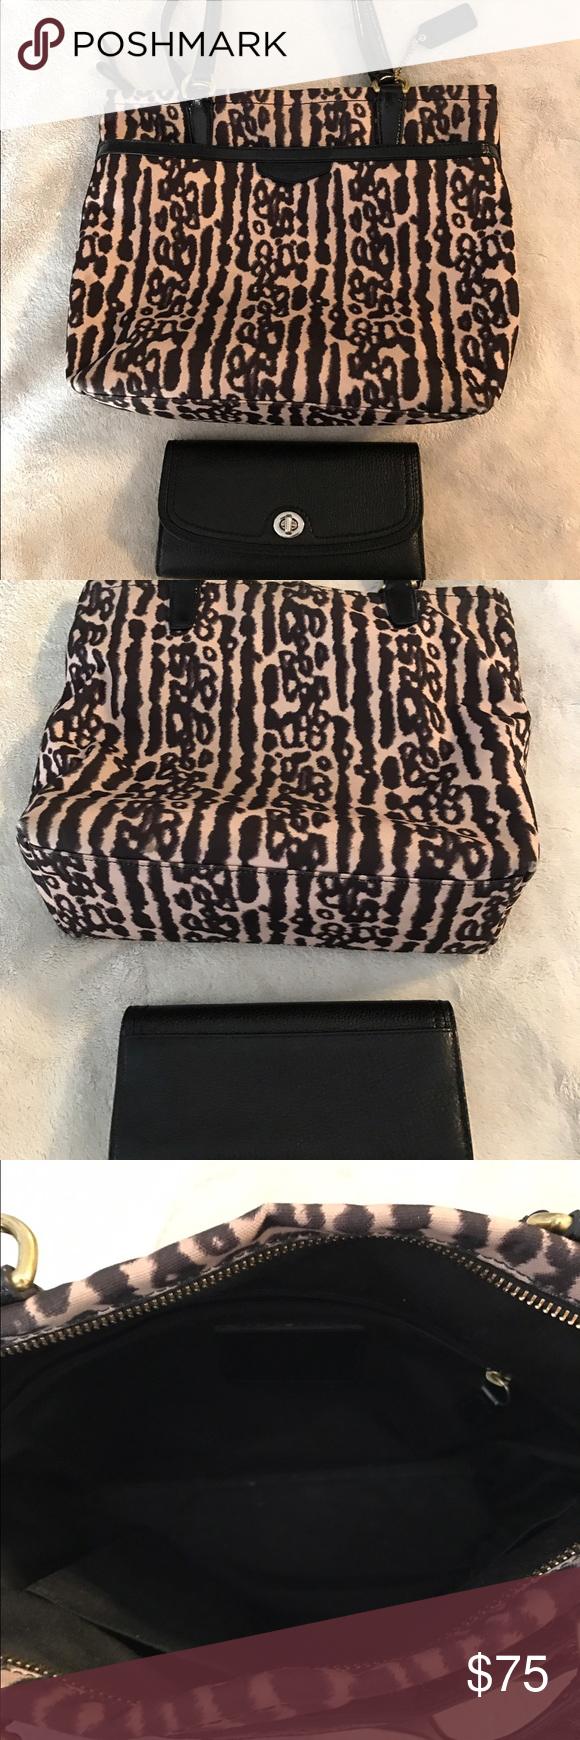 478548d1e2 free shipping used coach purse and wallet 25fa7 9a6a5